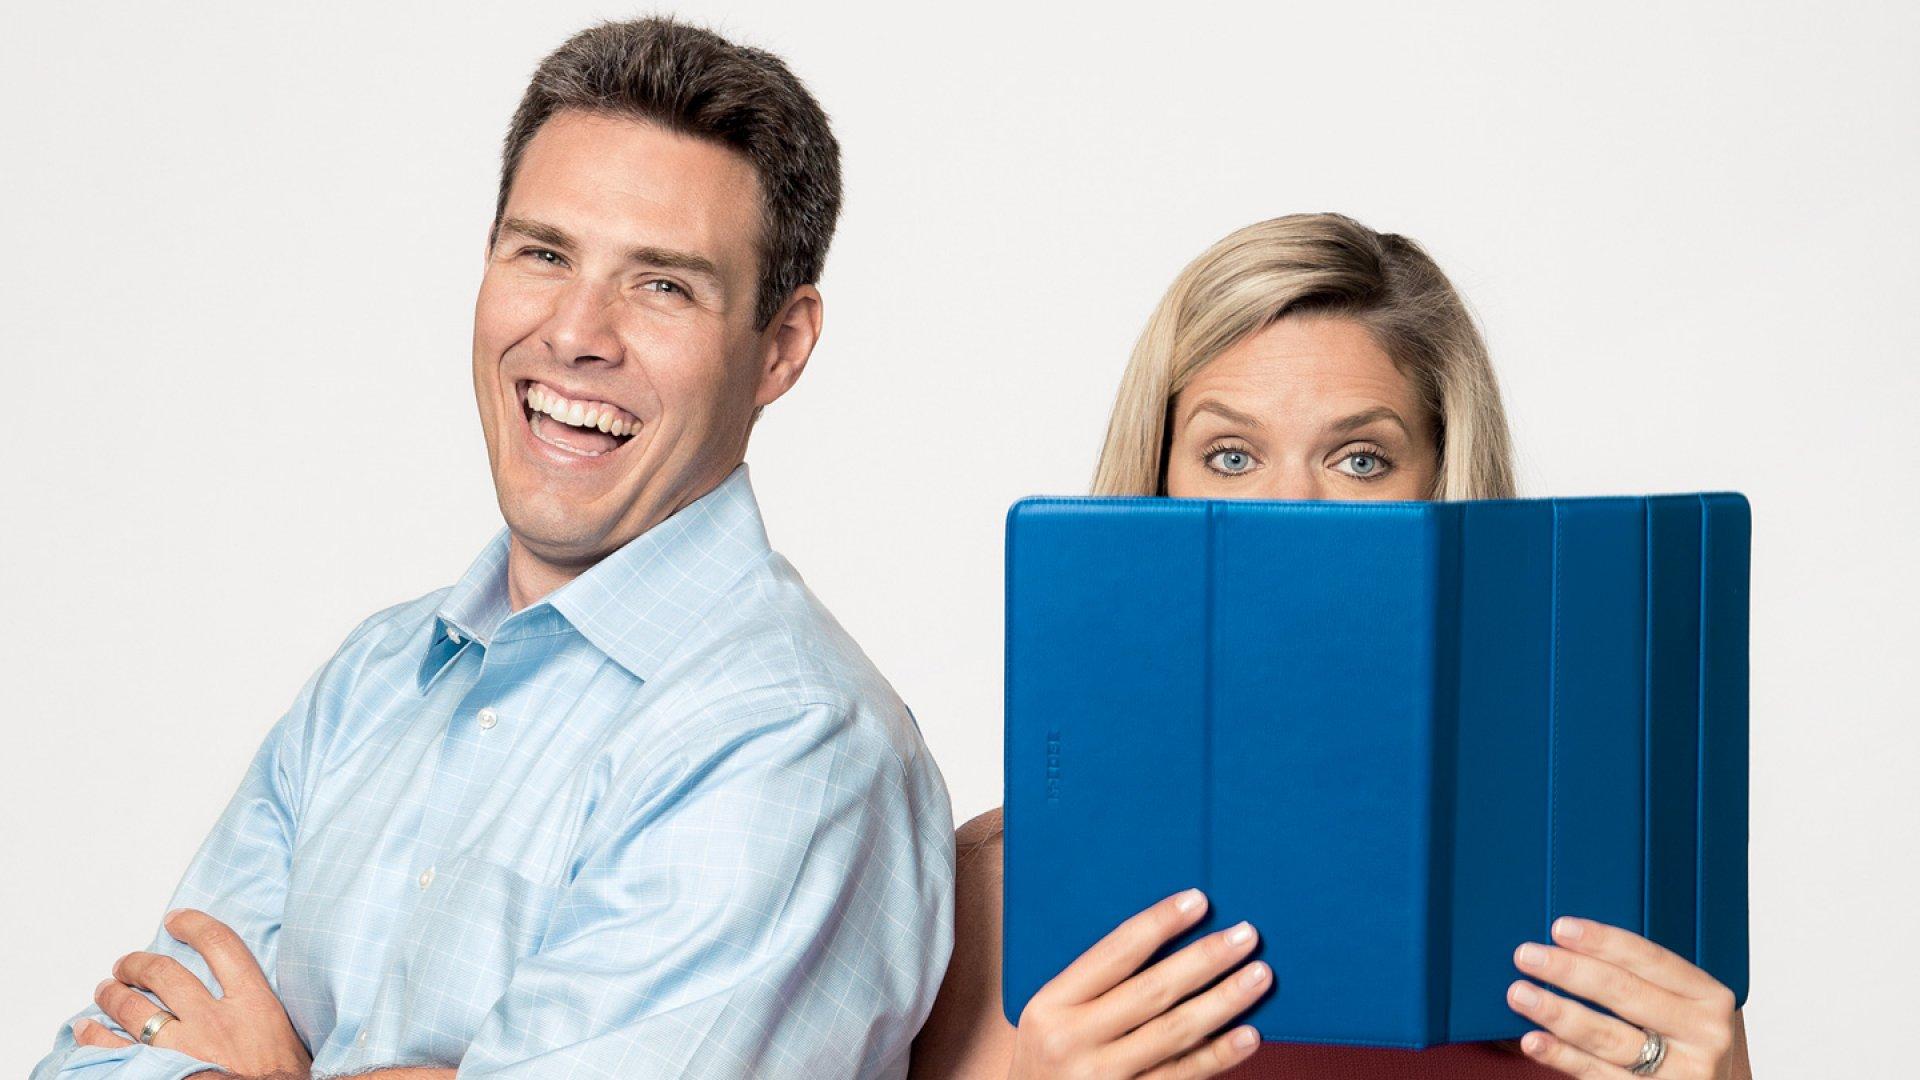 <b>Eureka Moment</b> Patrick Mish found inspiration in his wife Devon's fondness for digital books.